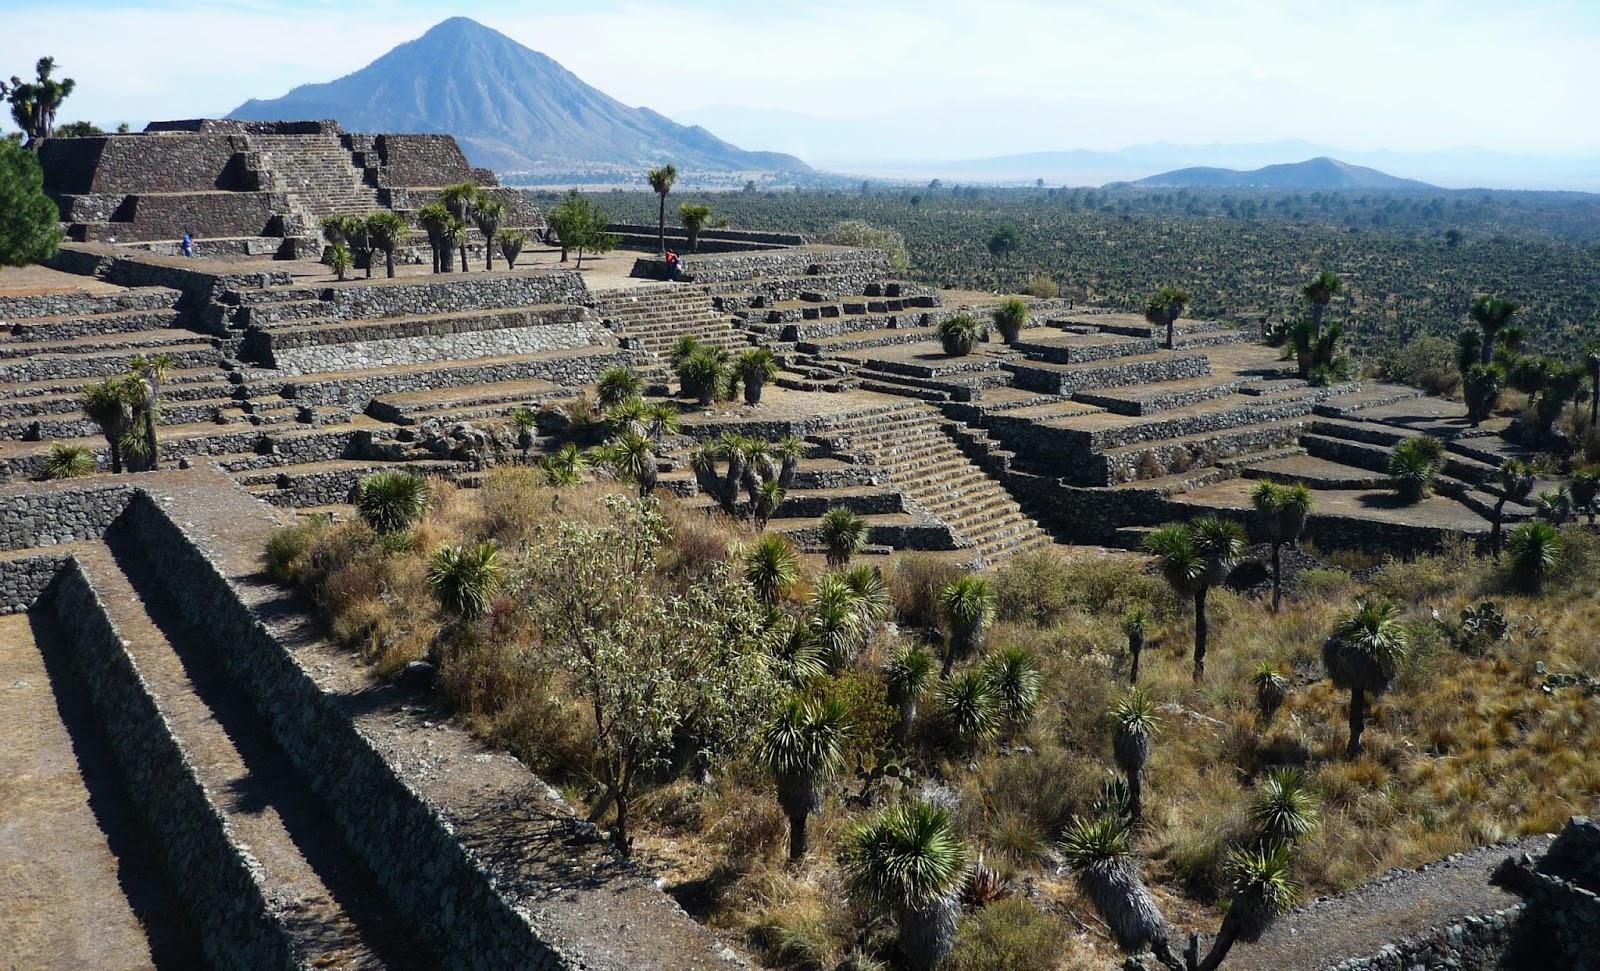 Mrippolito The Maya Inca And Aztec Civilizations